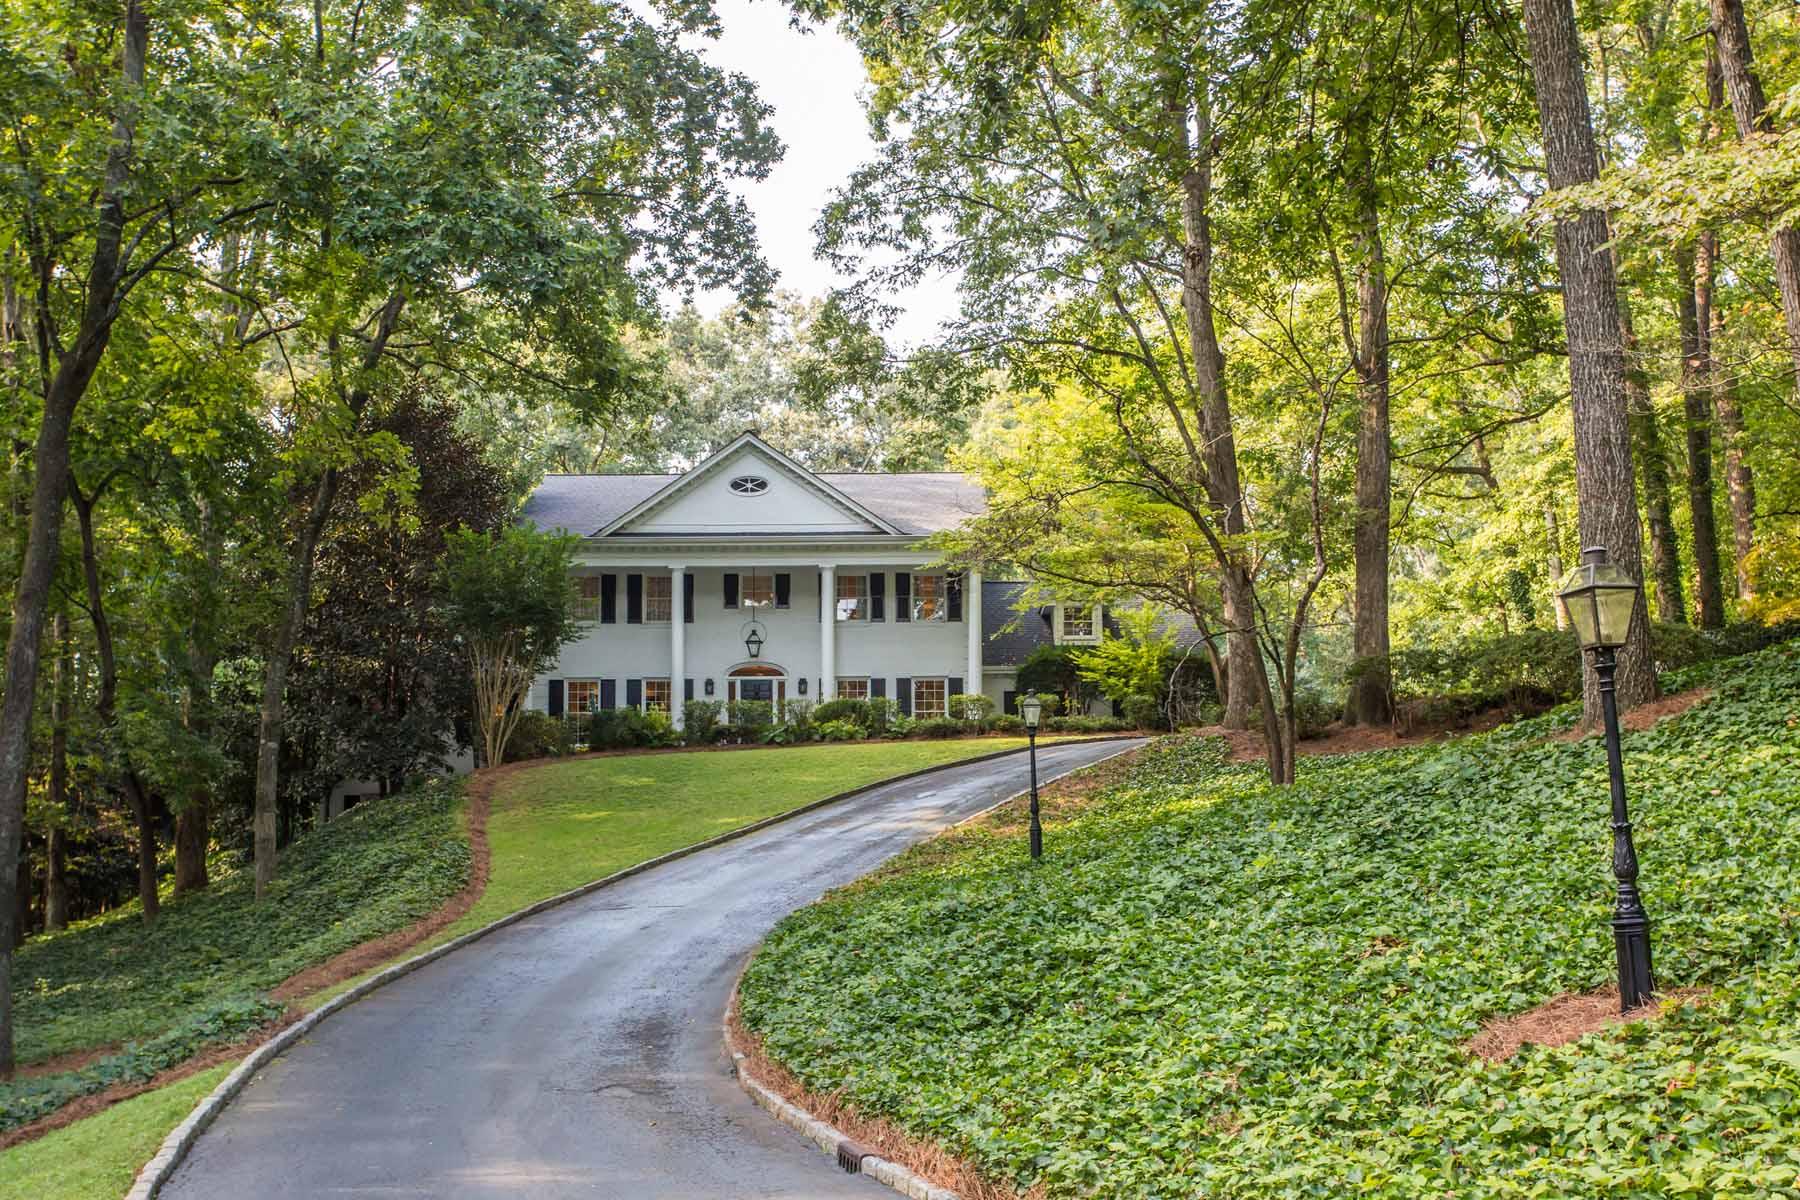 独户住宅 为 销售 在 Modern Elegance in the Heart of Chastain Park 4660 Paran Valley NW Chastain Park, 亚特兰大, 乔治亚州, 30327 美国